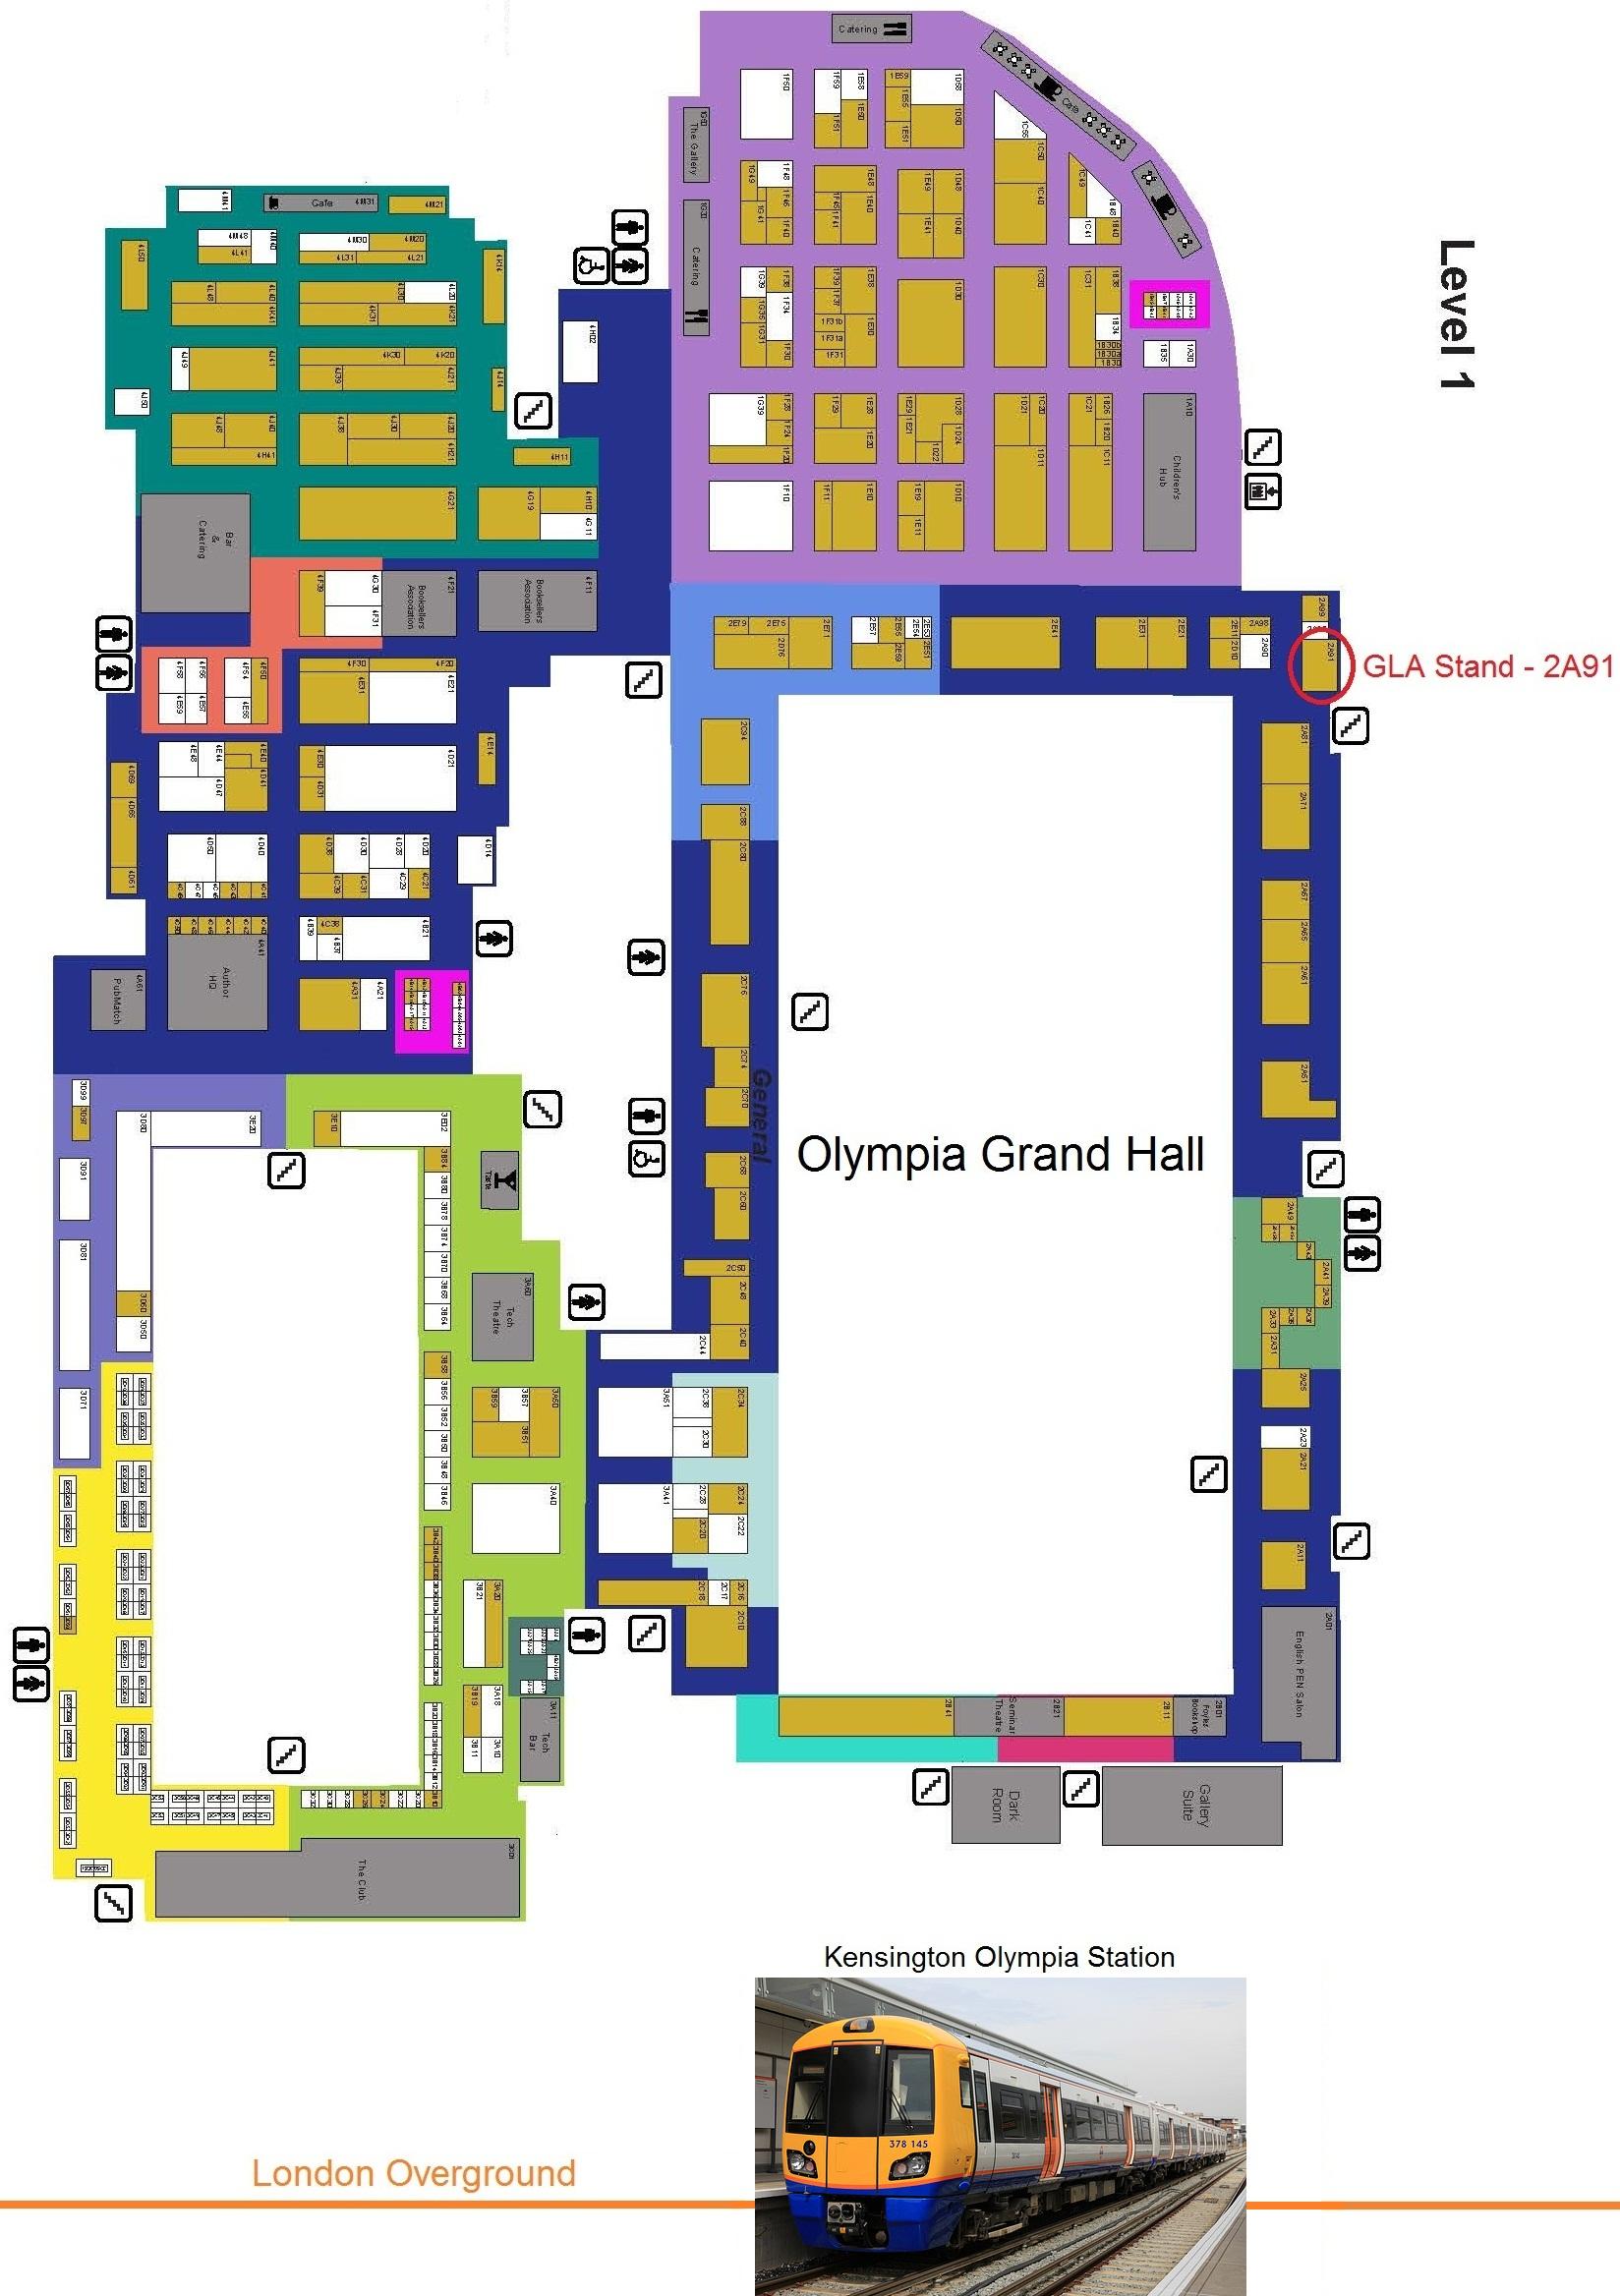 News publishers representation gla world wide representation bookfair 2016 lbf 1st floor map gumiabroncs Gallery